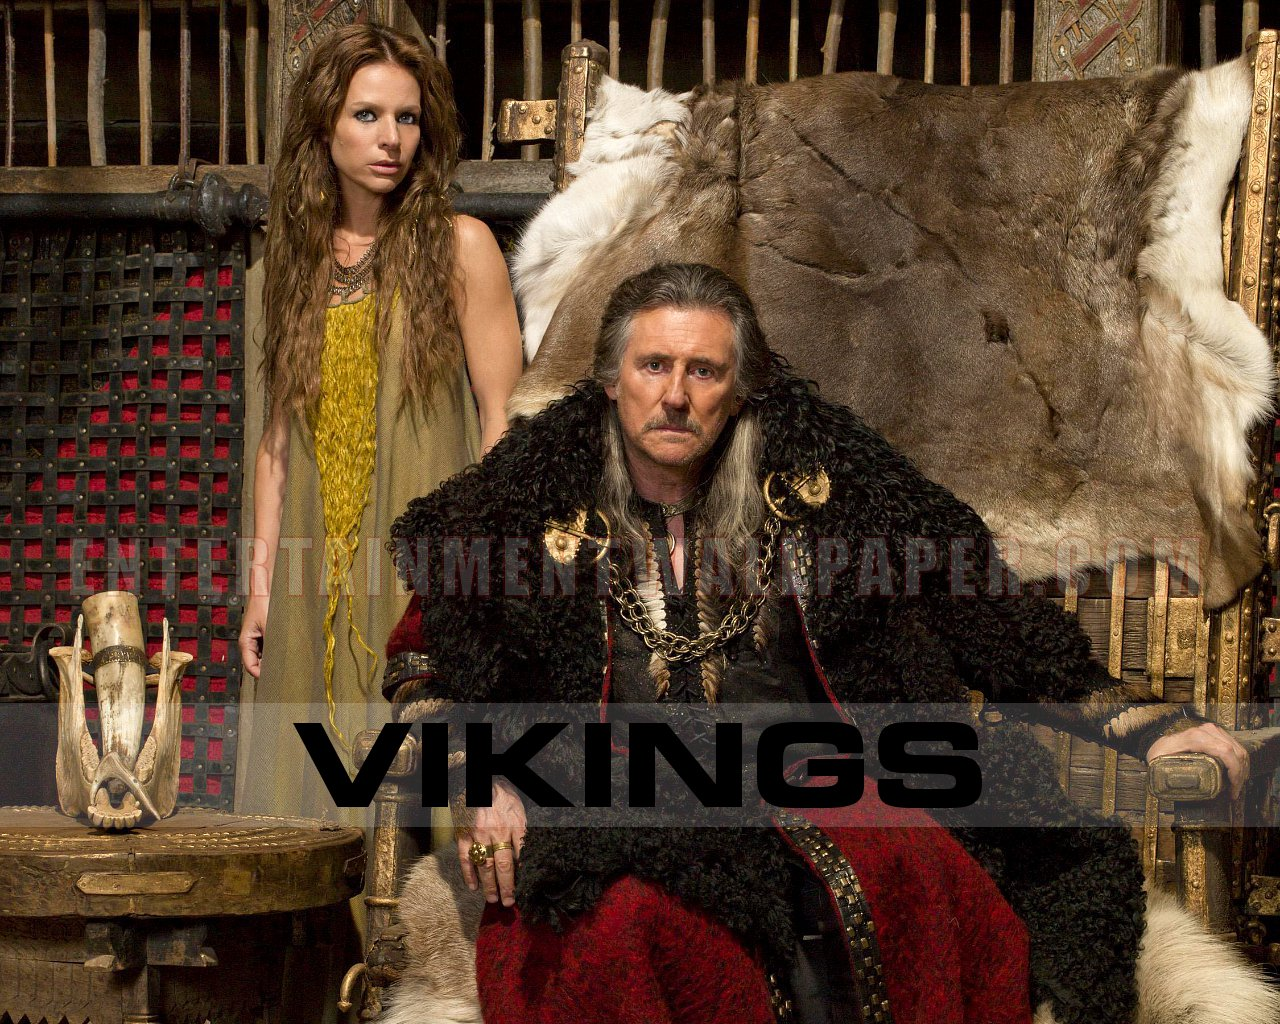 Vikings   Vikings TV Series Wallpaper 34569089 1280x1024